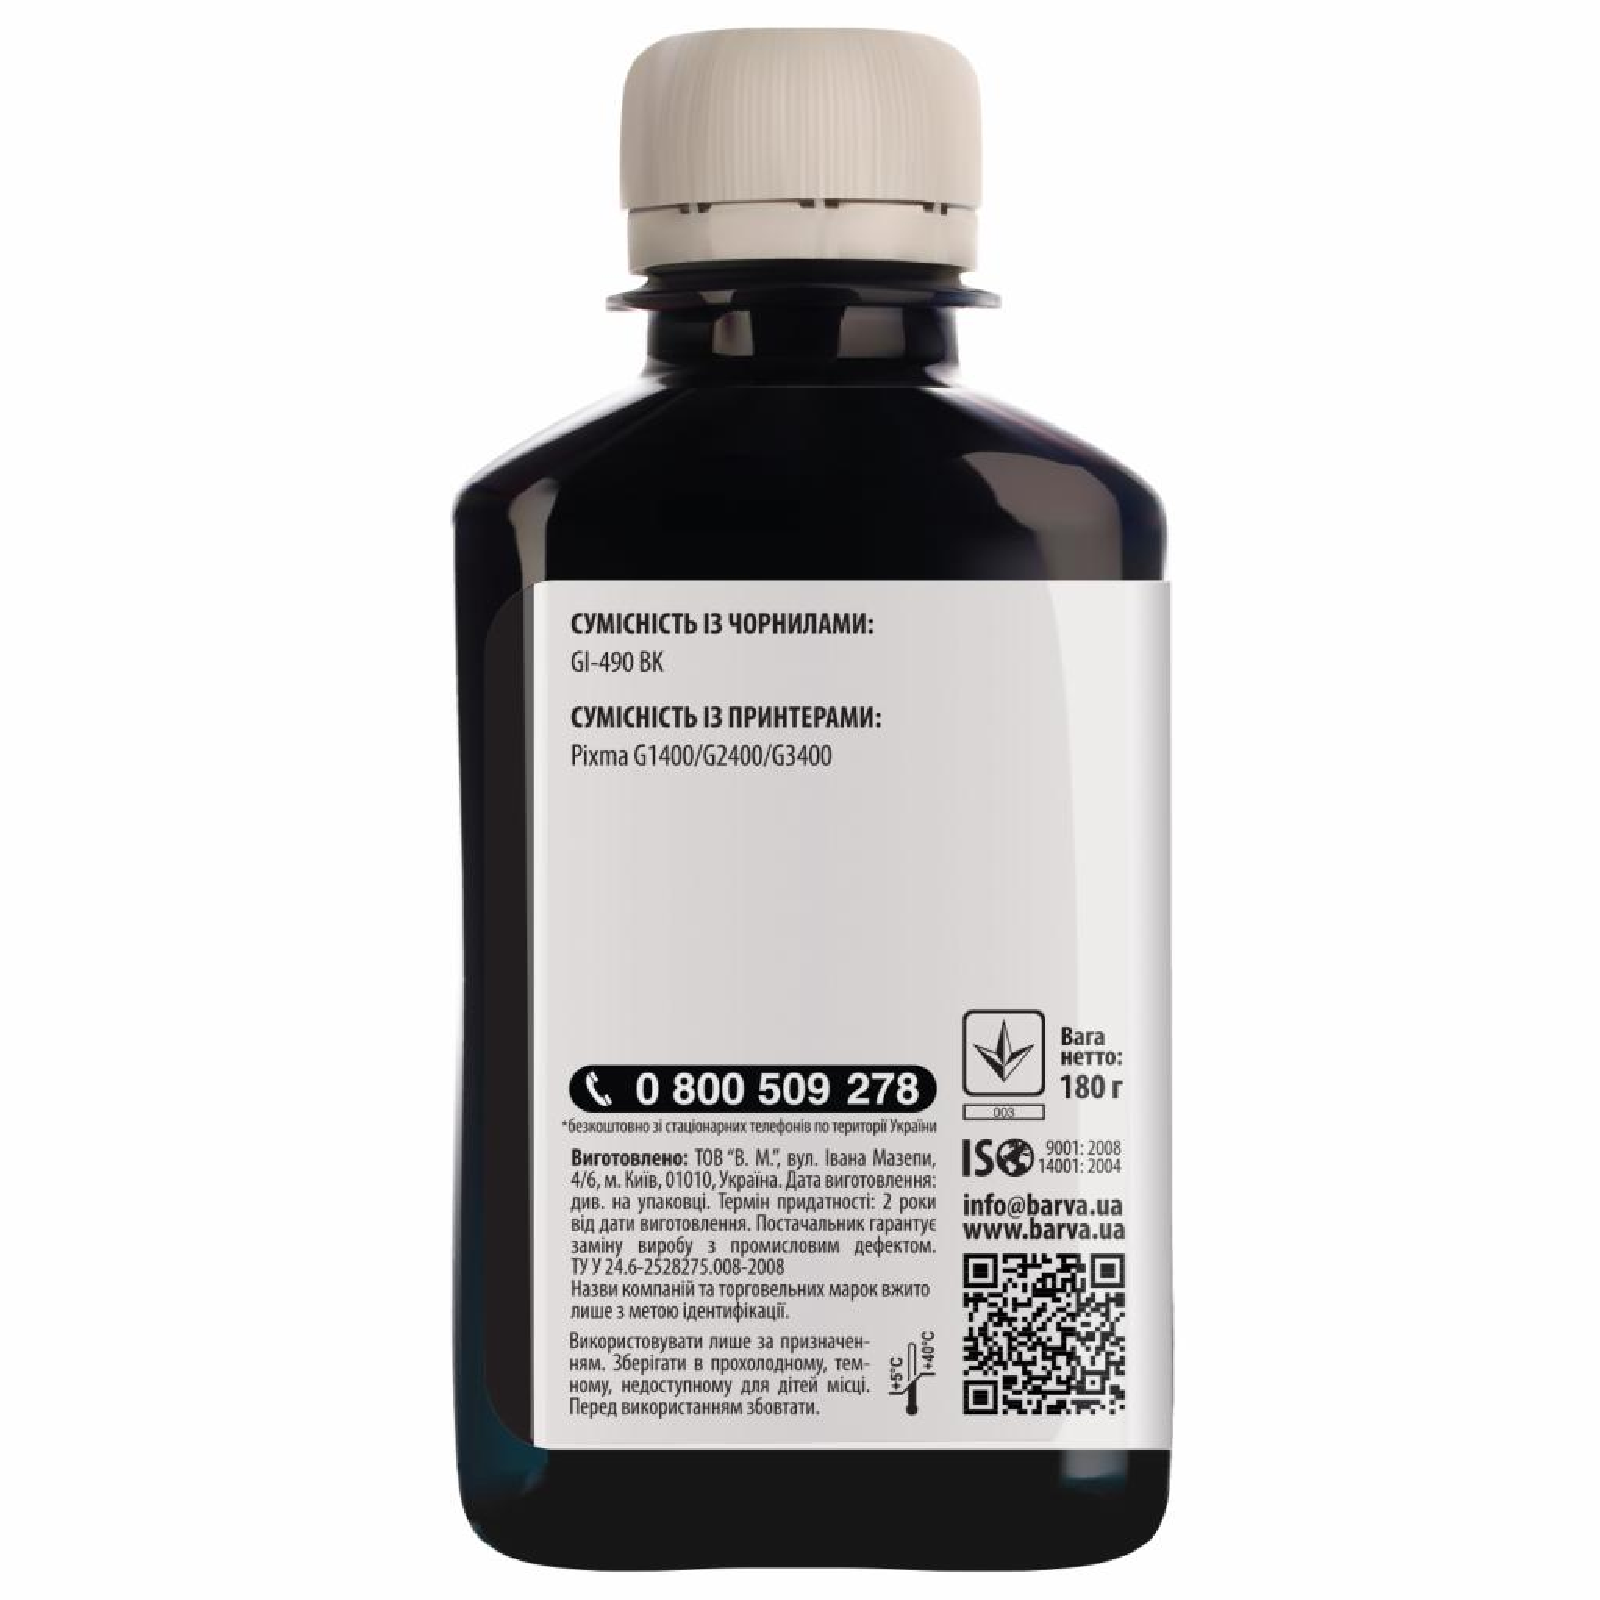 Чернила BARVA CANON GI-490 180г BLACK Pigmented (G490-503) изображение 2